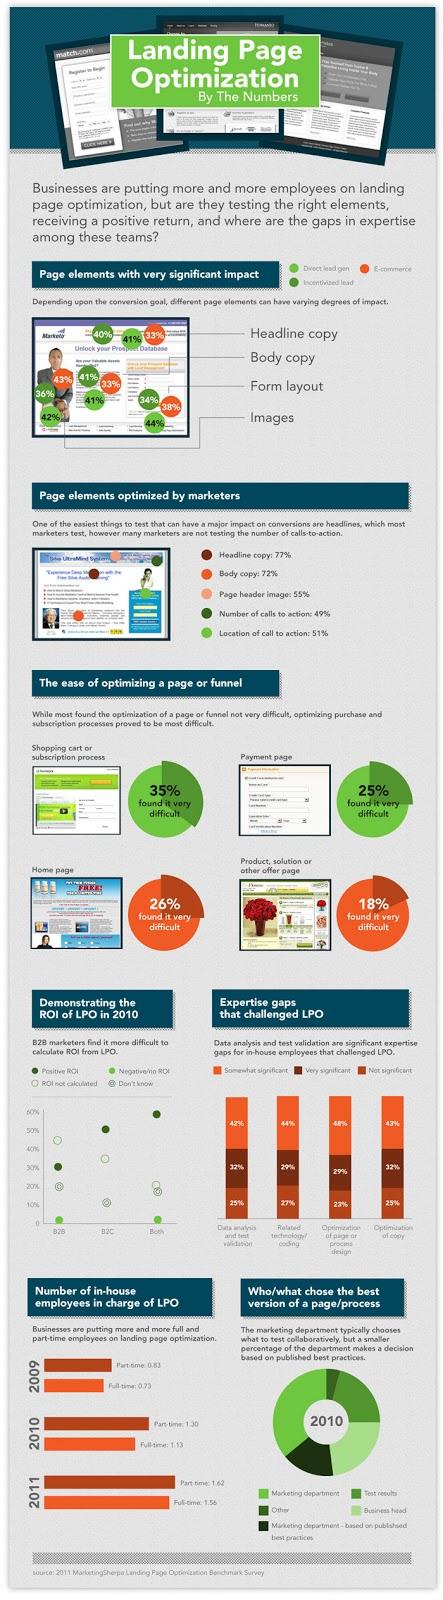 Landing Page Optimization Infographic